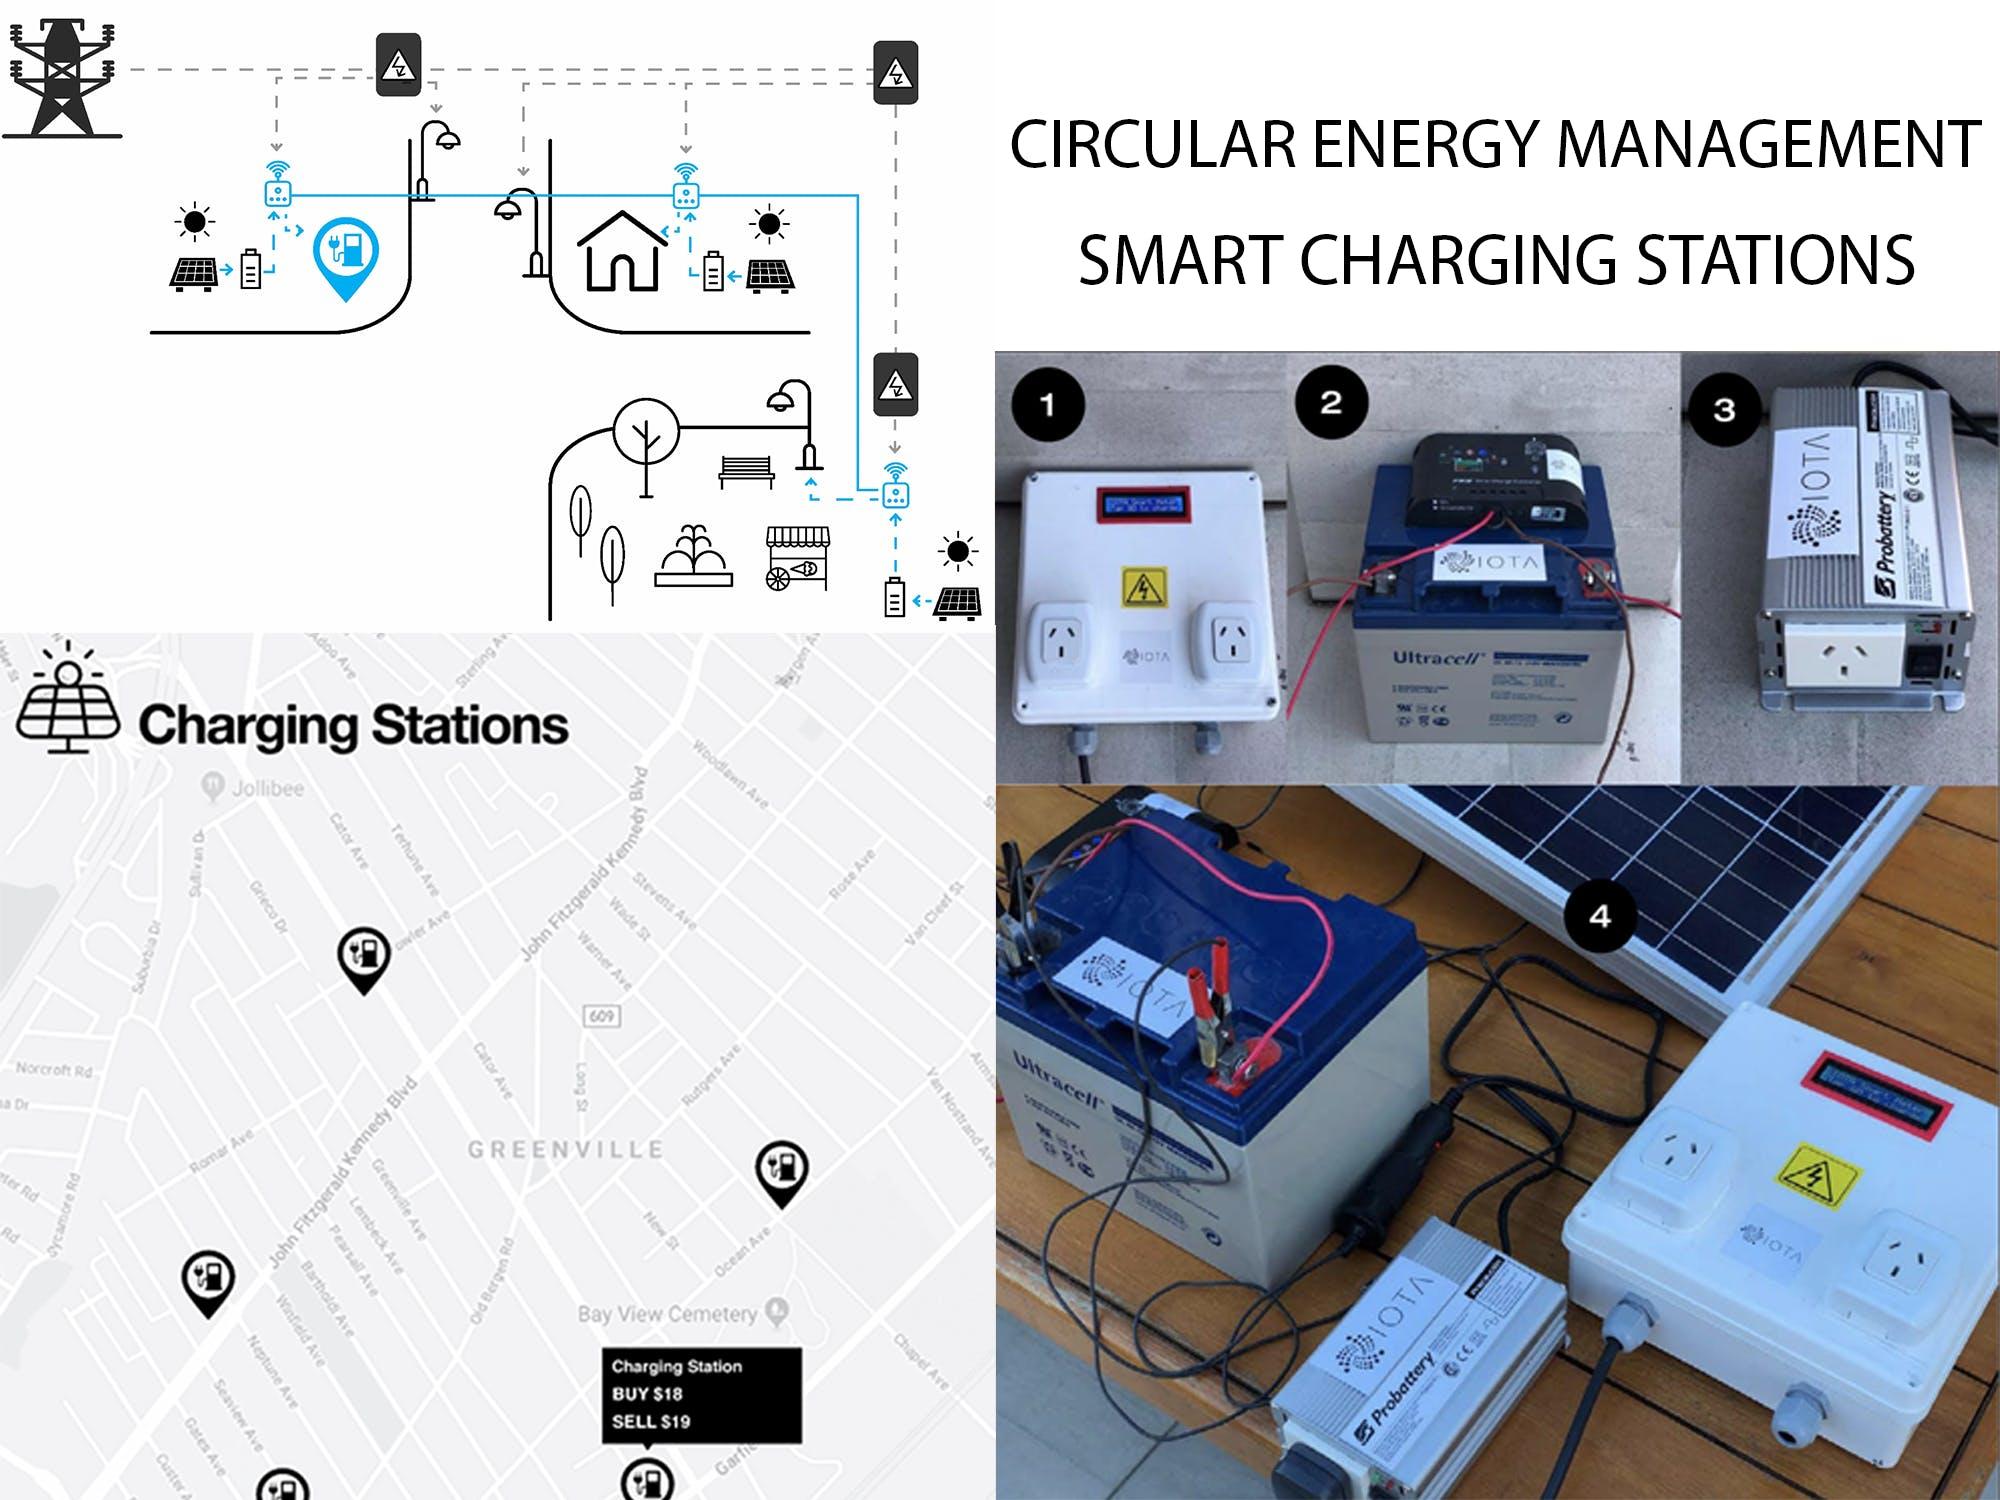 Circular Energy - Renewable Energy Charging Station Network